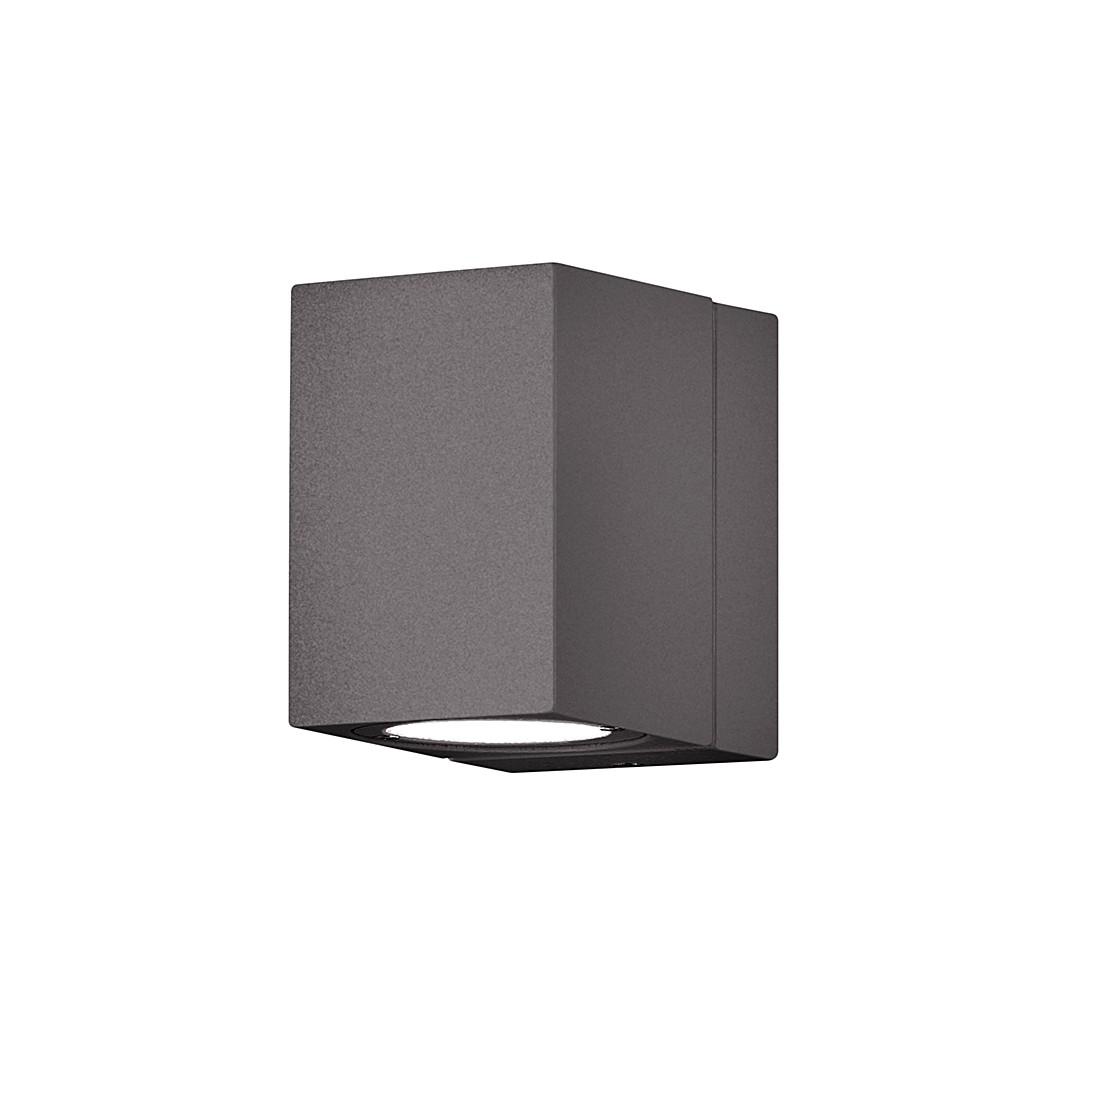 EEK A+, LED-Außenleuchte Tiber - Aluminium / Kunststoff - Anthrazit - 1-flammig, Trio